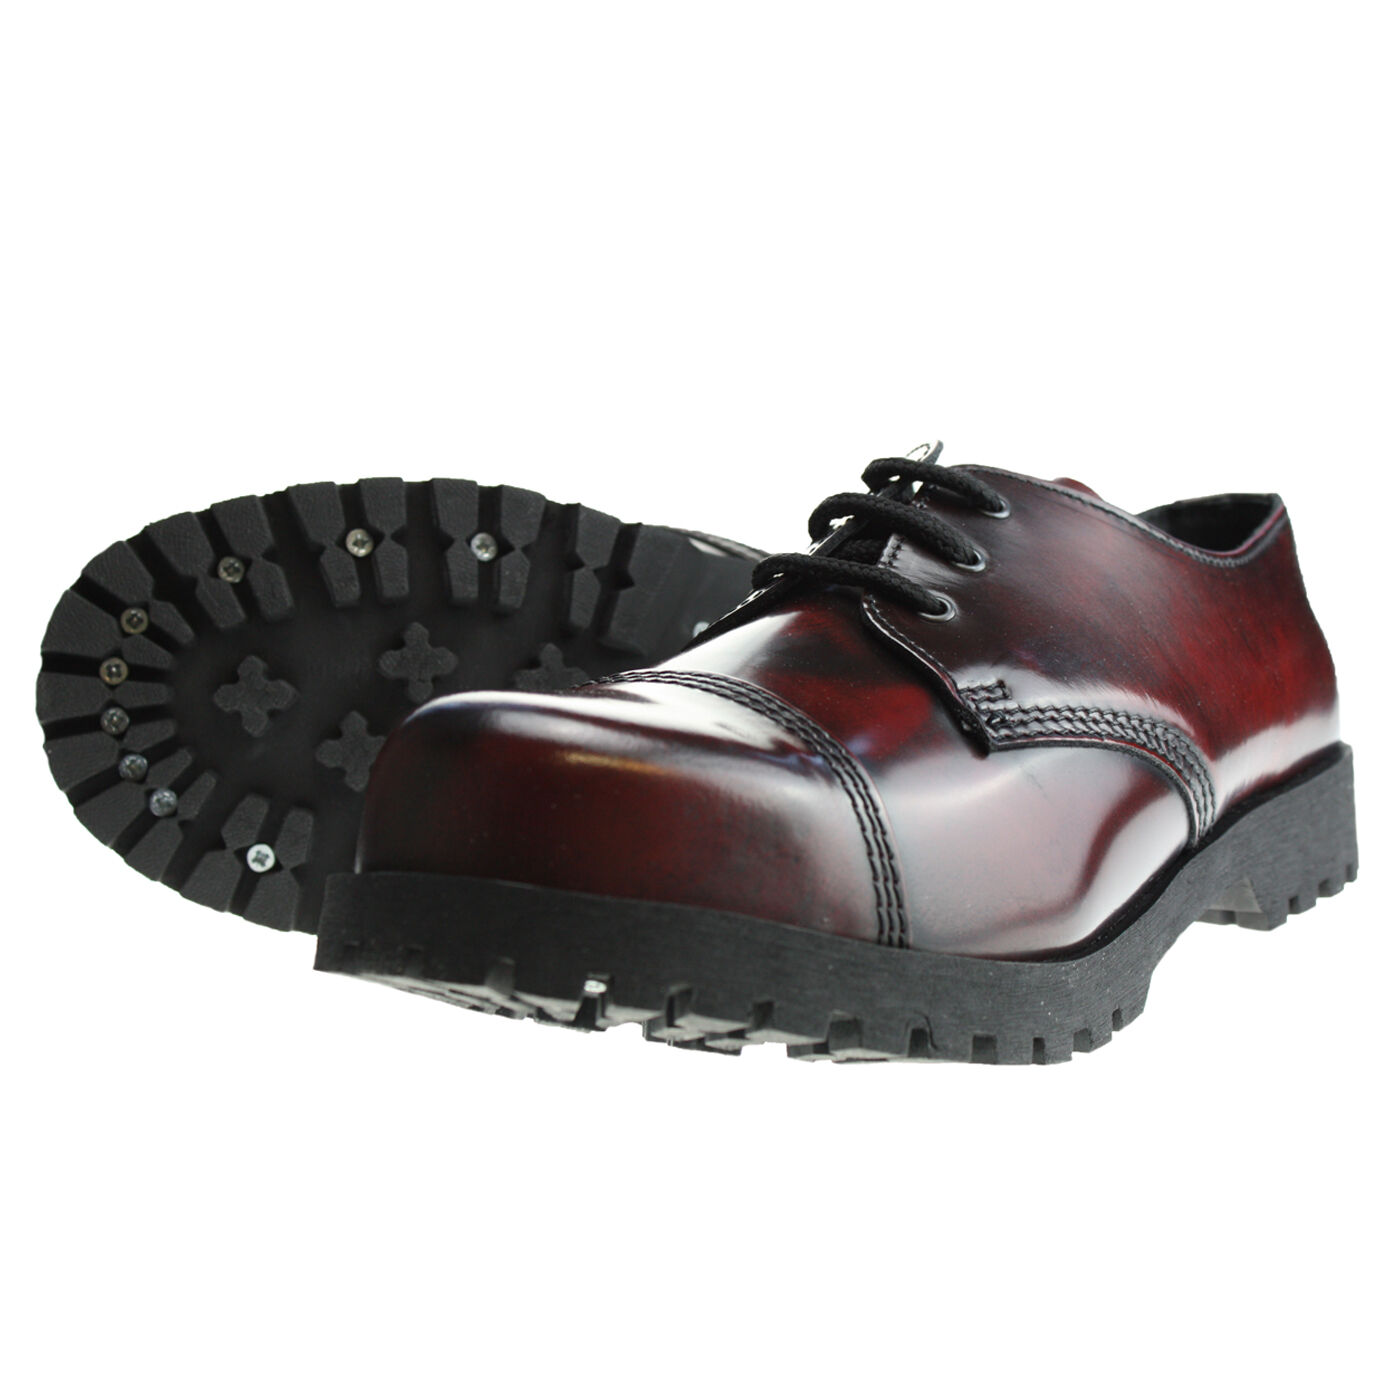 Stiefel Rub-Off and Braces 3-Loch Burgundy Rub-Off Stiefel Schuhe Rangers Rot Schwarz Stahlkappe ac9244